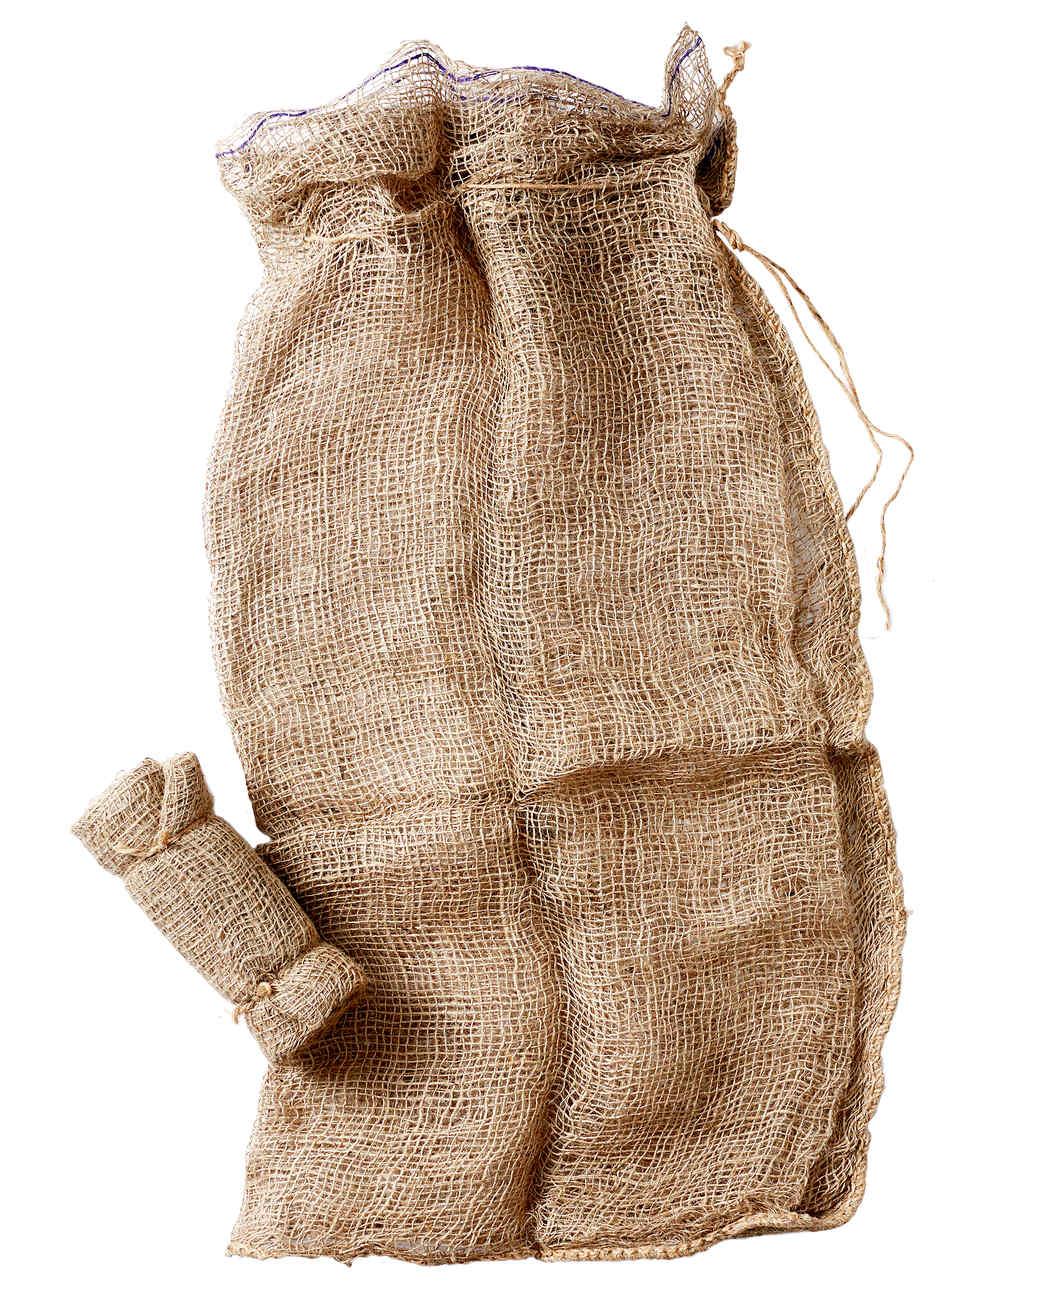 jute-leaf-bag-004-d111396.jpg